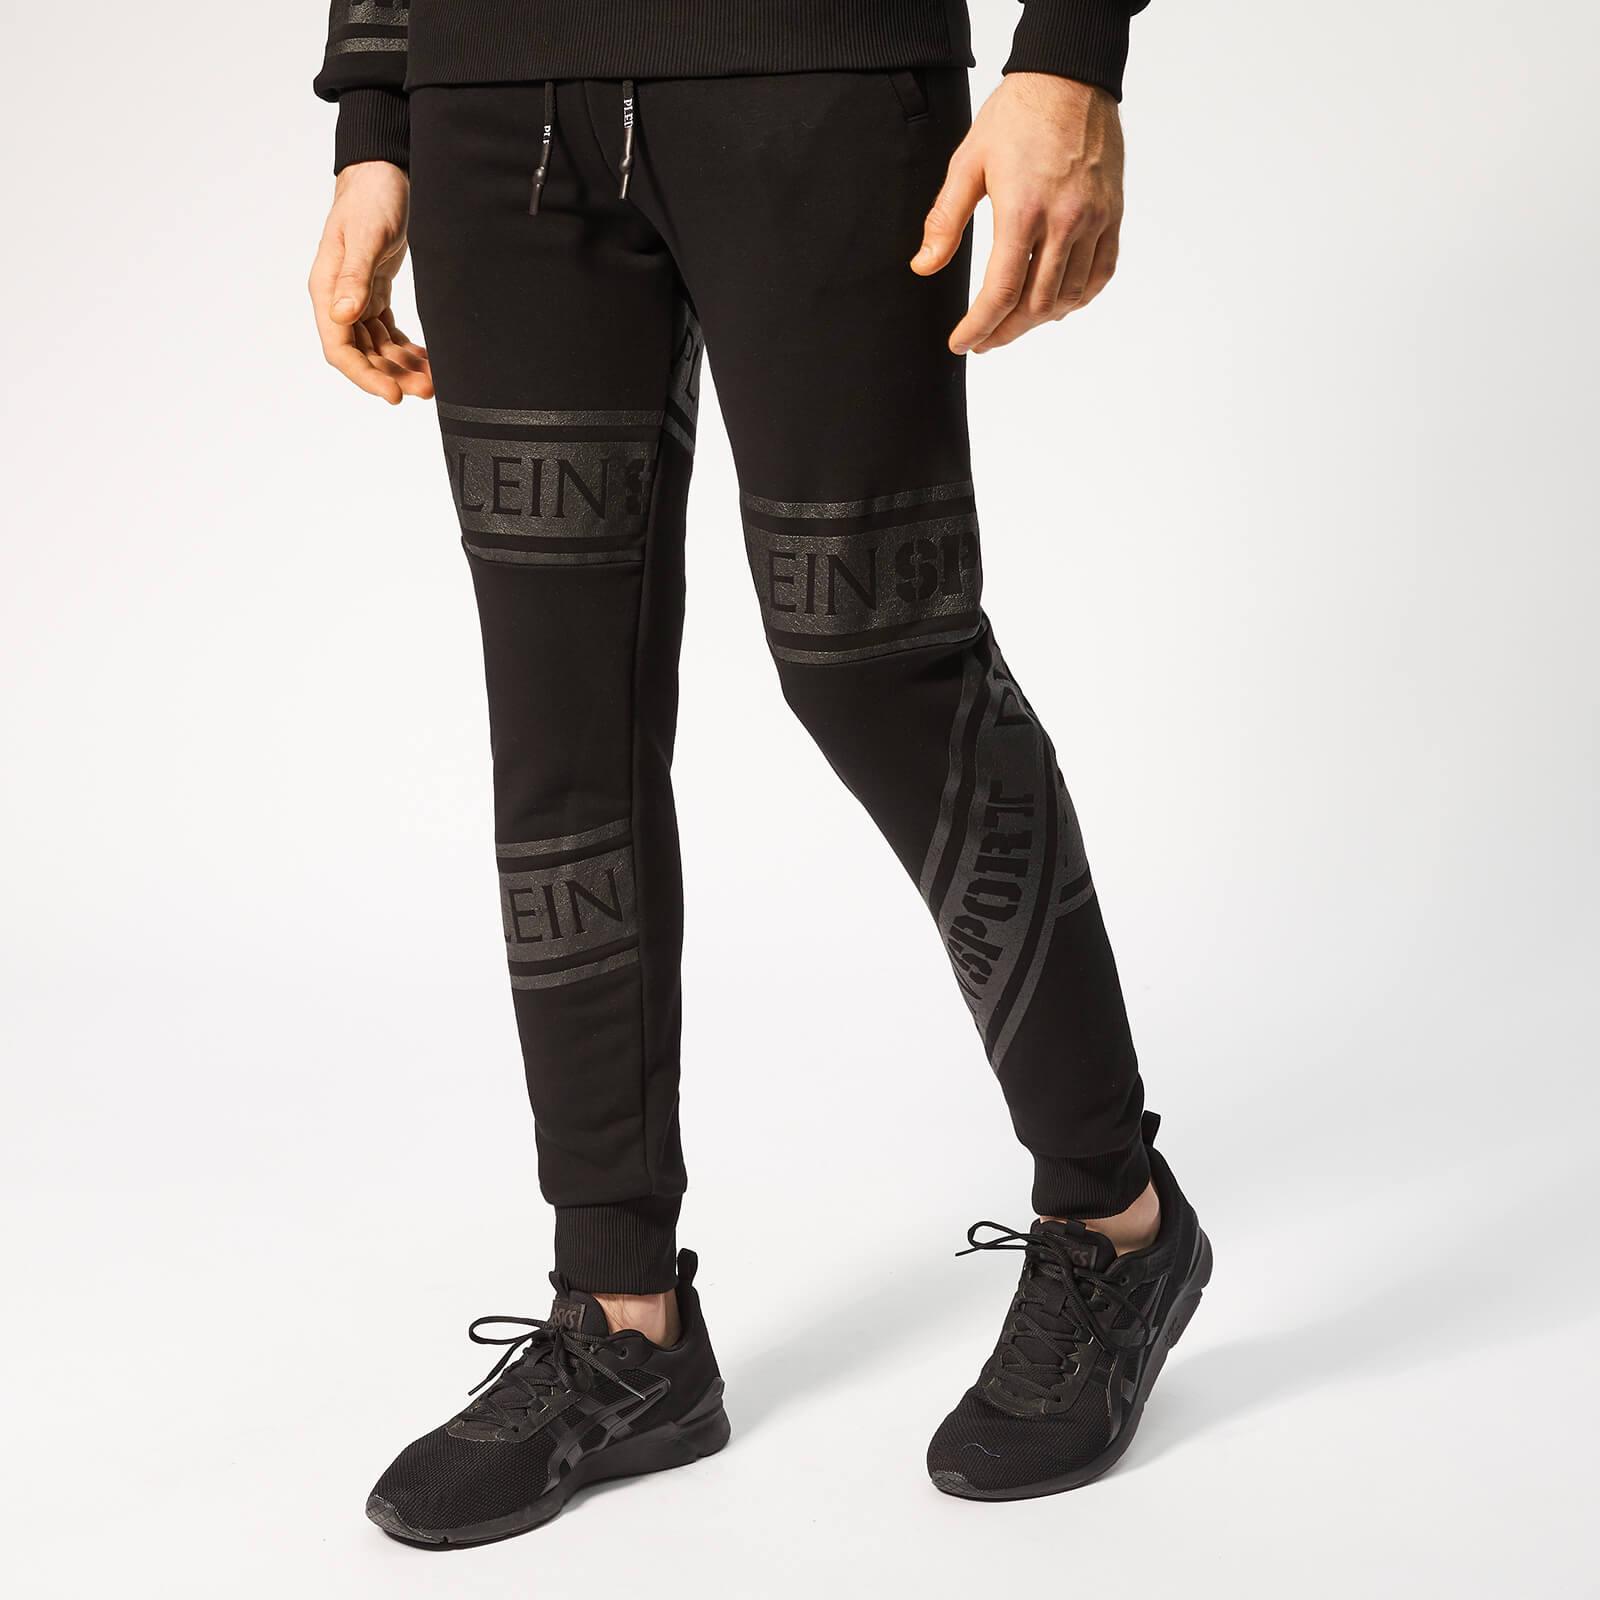 Plein Sport Men's Tape Stripes Jogging Trousers - Black - XXL - Black